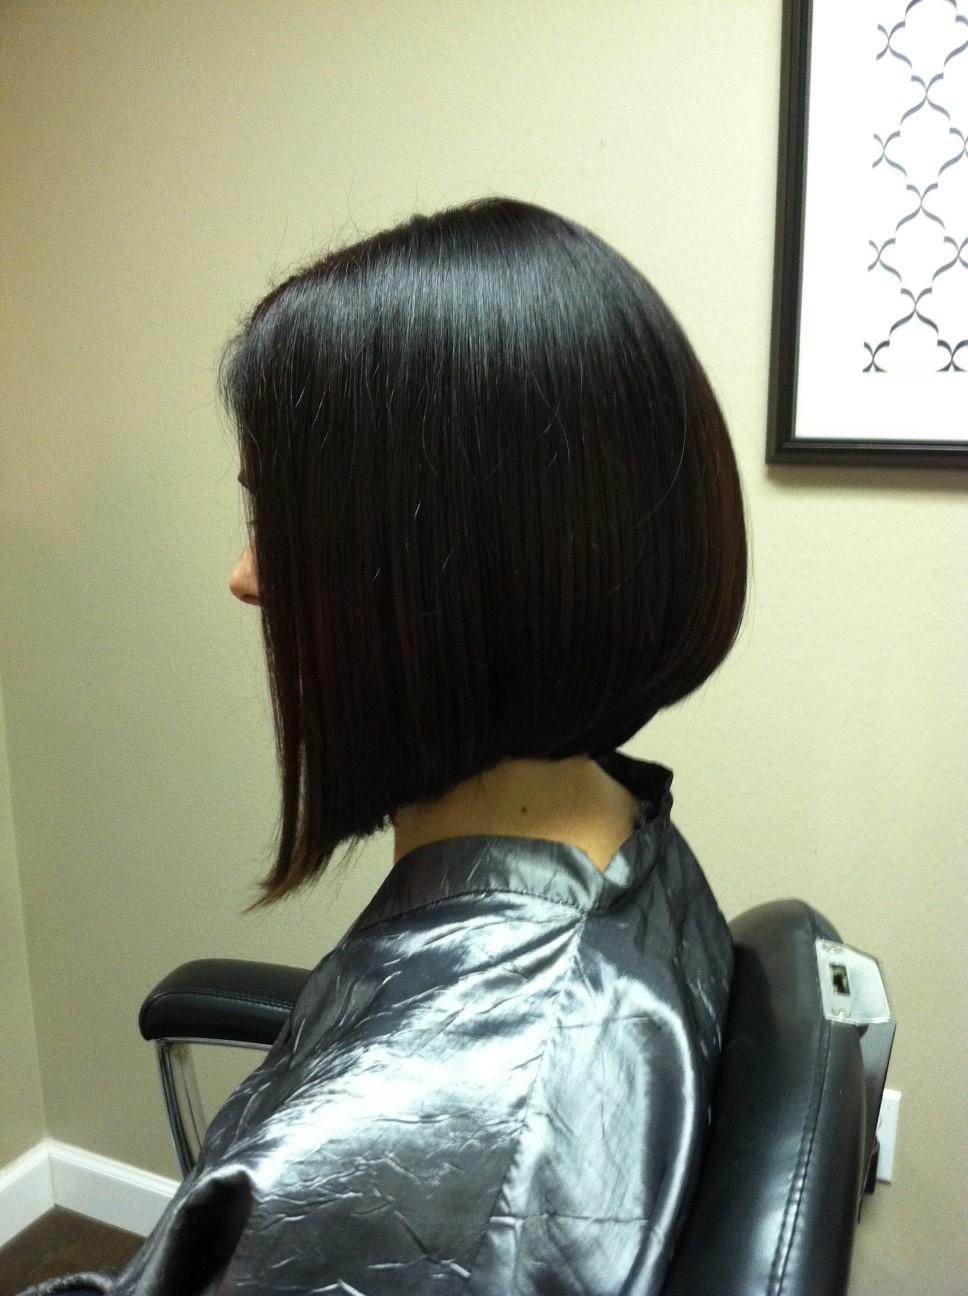 Kelly M Harmsen - Owner of Bossa Nova Hair & Art Salon